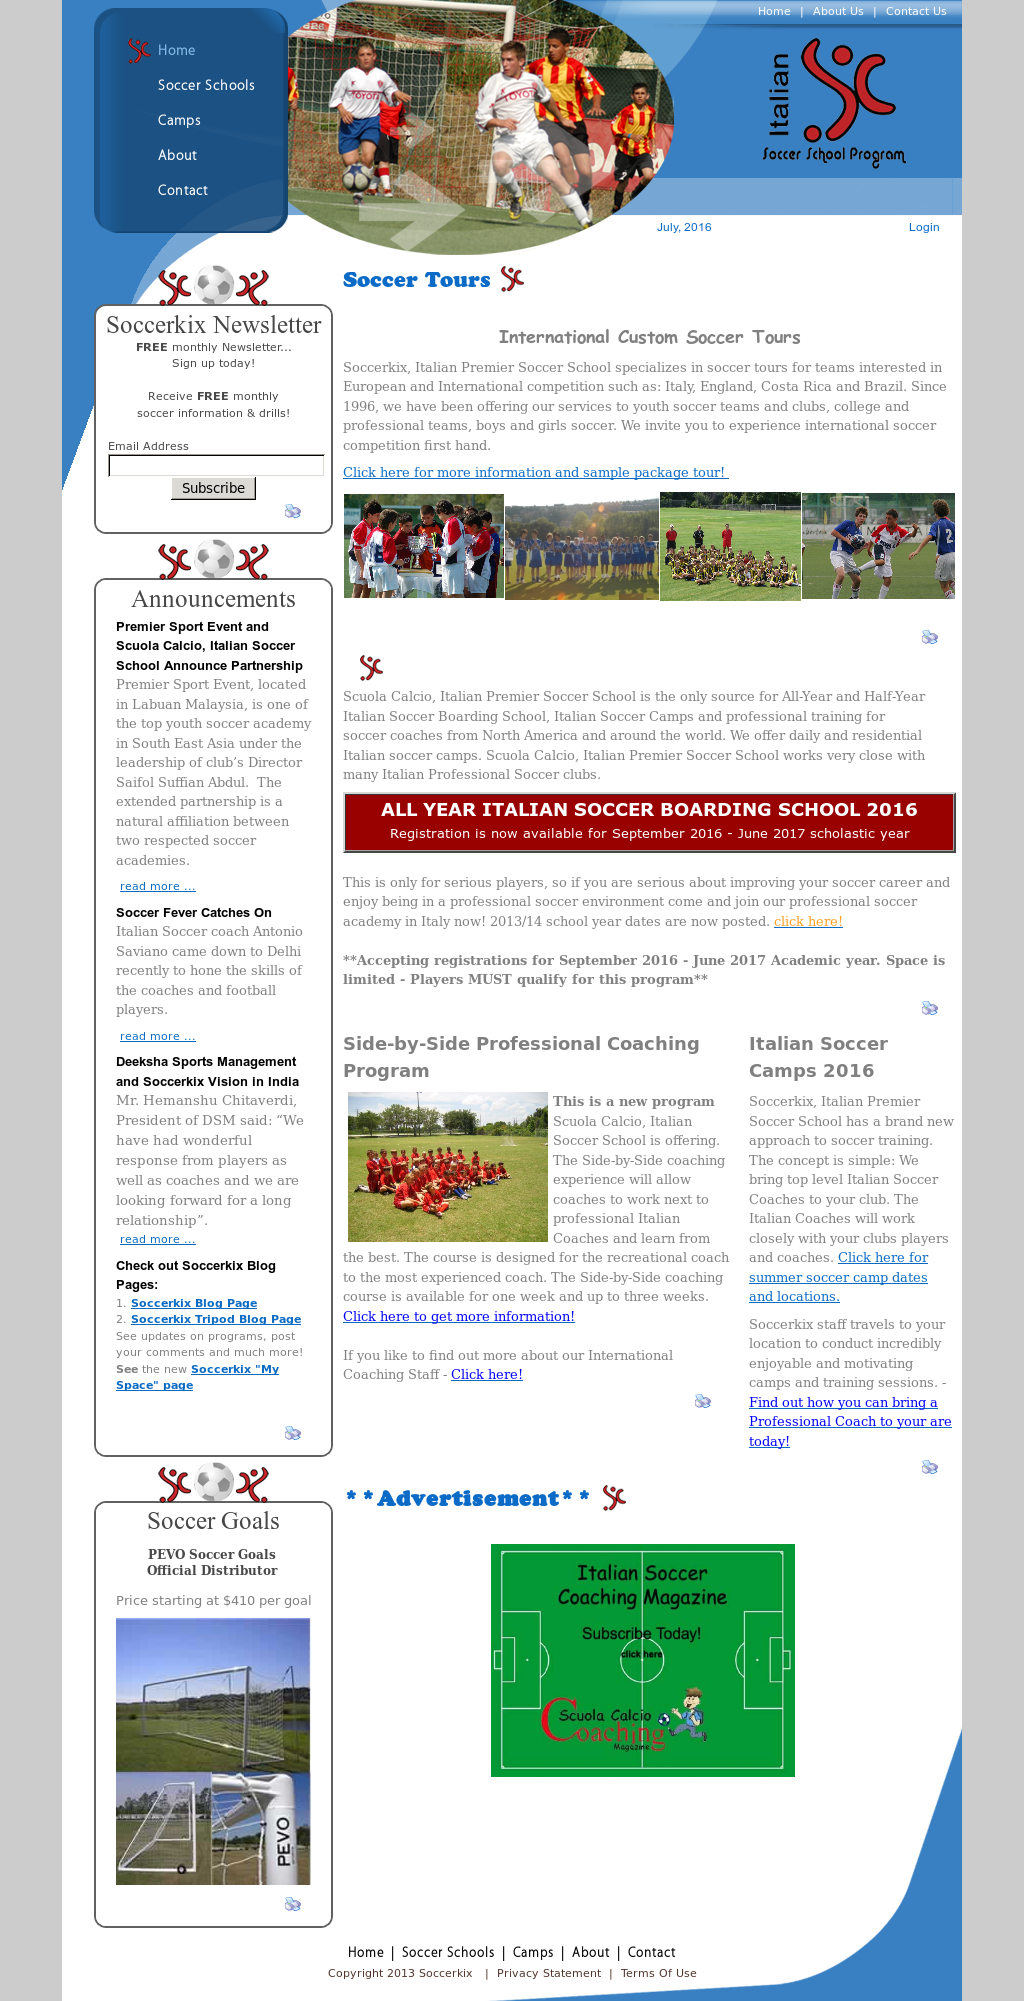 Soccerkix Competitors, Revenue and Employees - Owler Company Profile